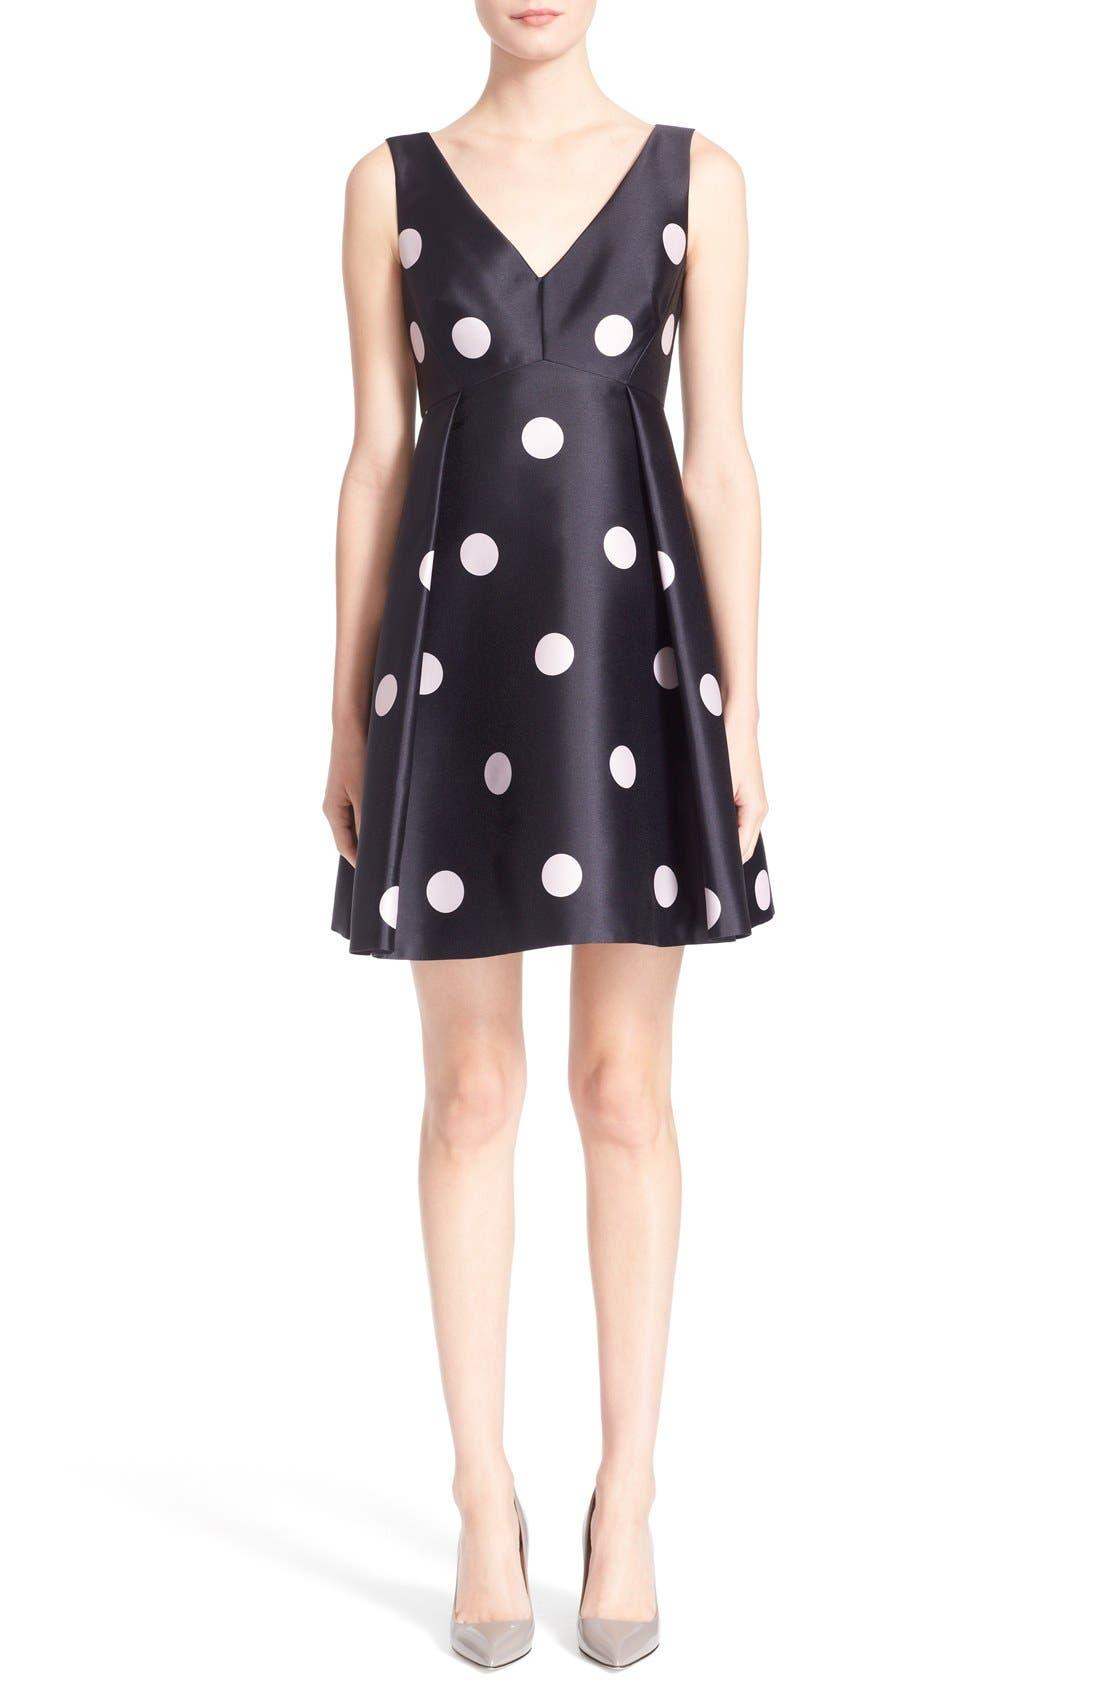 Alternate Image 1 Selected - kate spade new york v-neck polka dot fit & flare dress